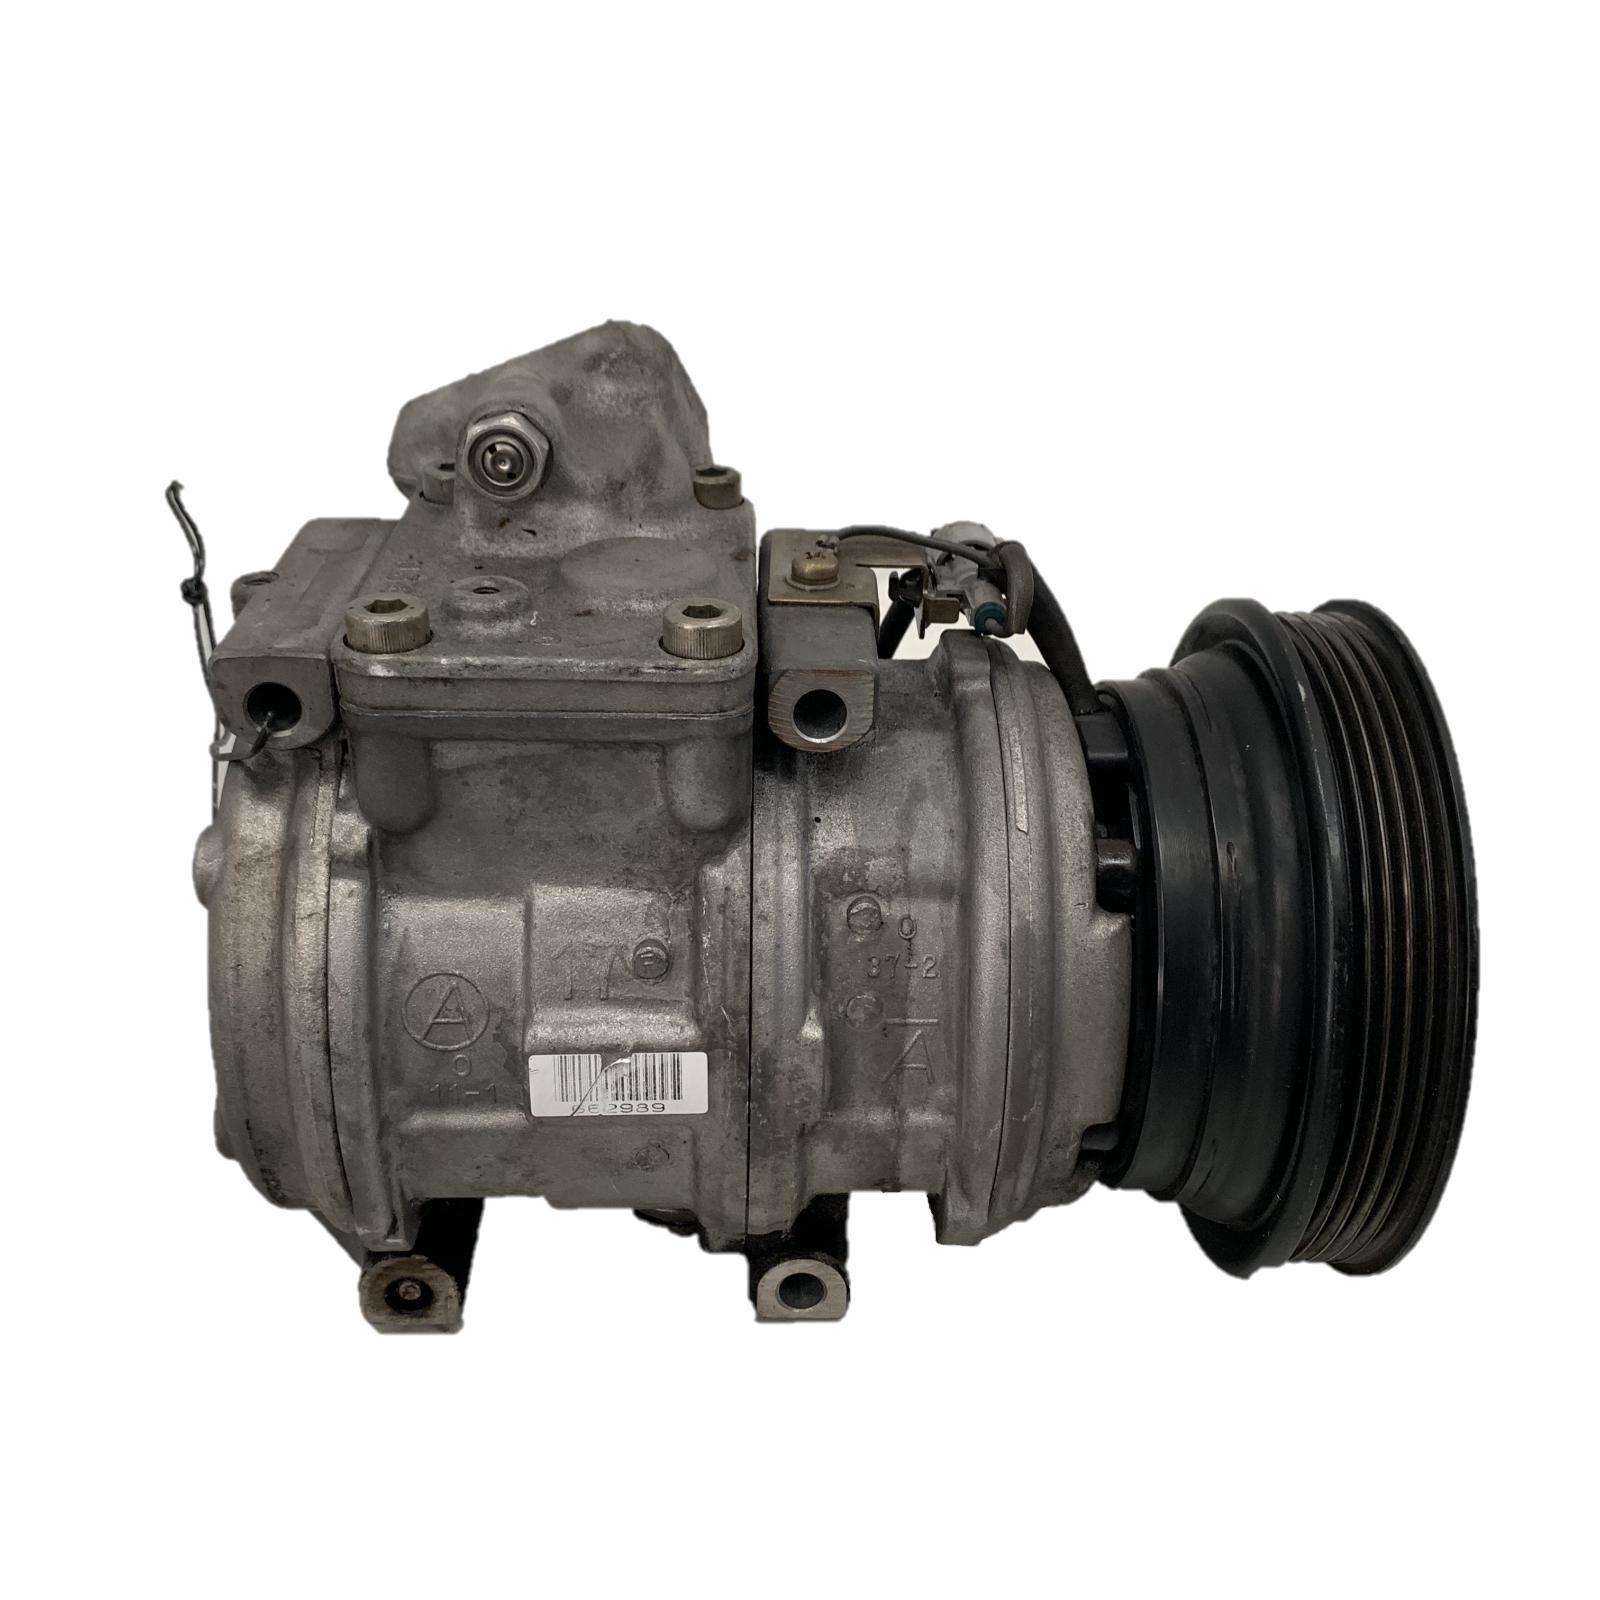 TOYOTA CAMRY, A/C Compressor, SK20, 2.2, 5S-FE, NIPPON DENSO, 10PA17C R134 GAS, 08/97-08/02